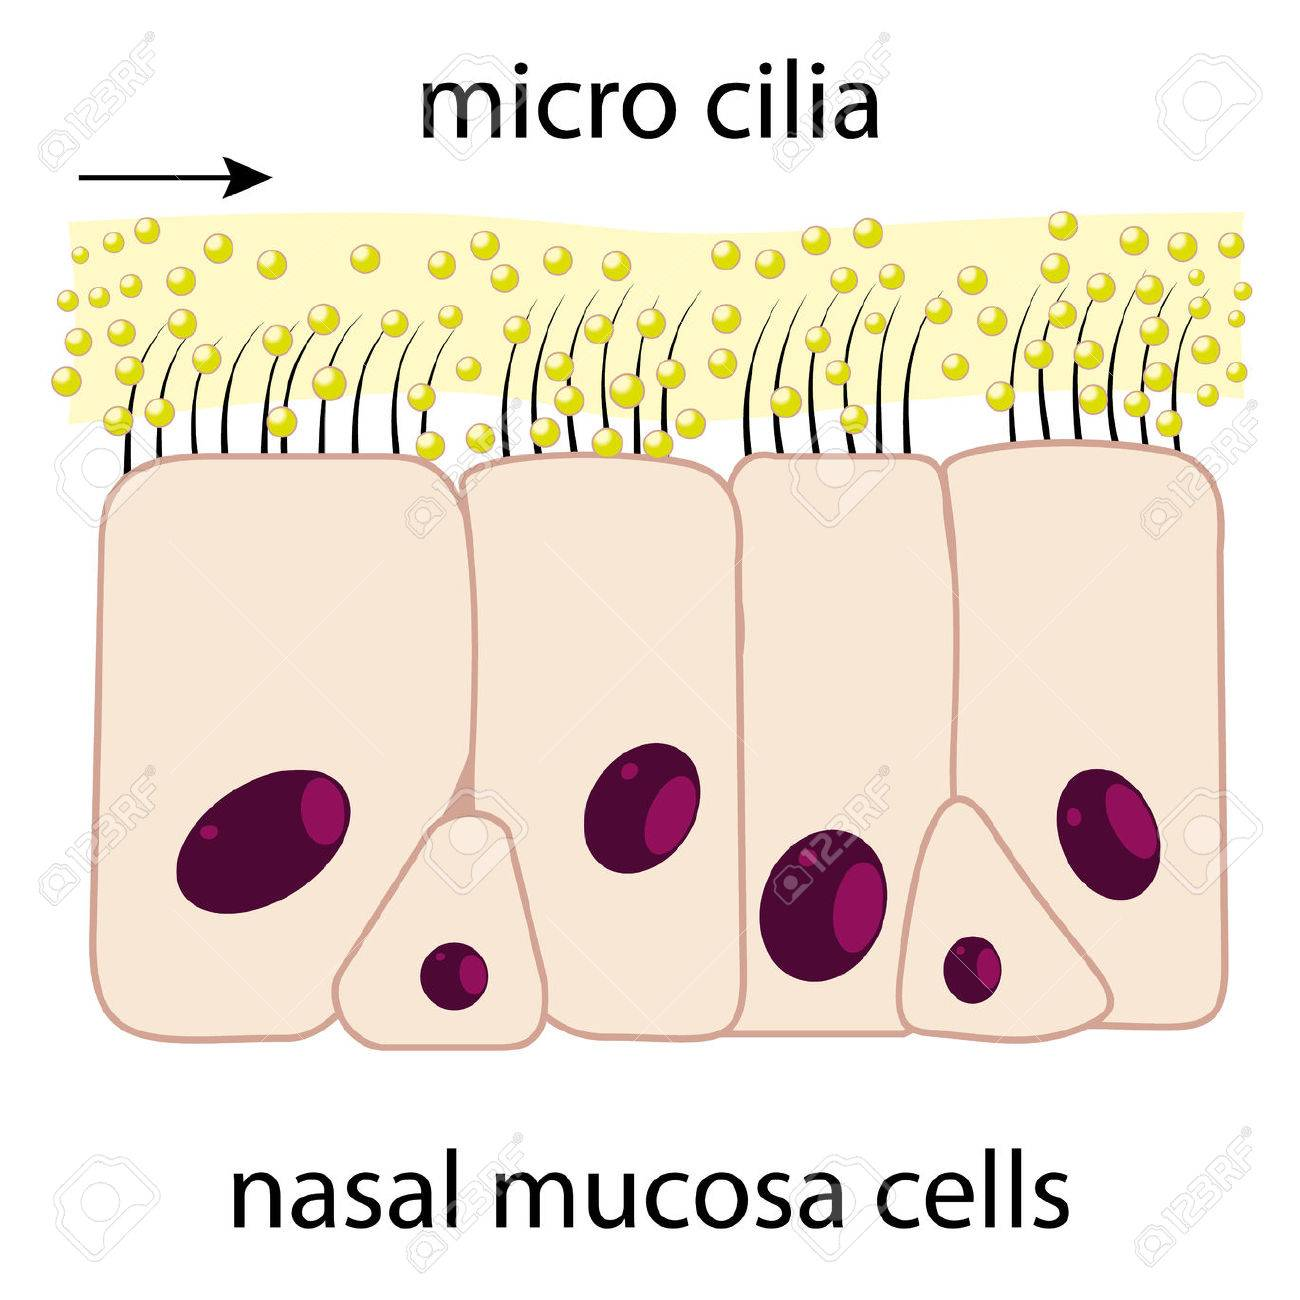 Nasal mucosa cells and micro cilia vector scheme - 30928178